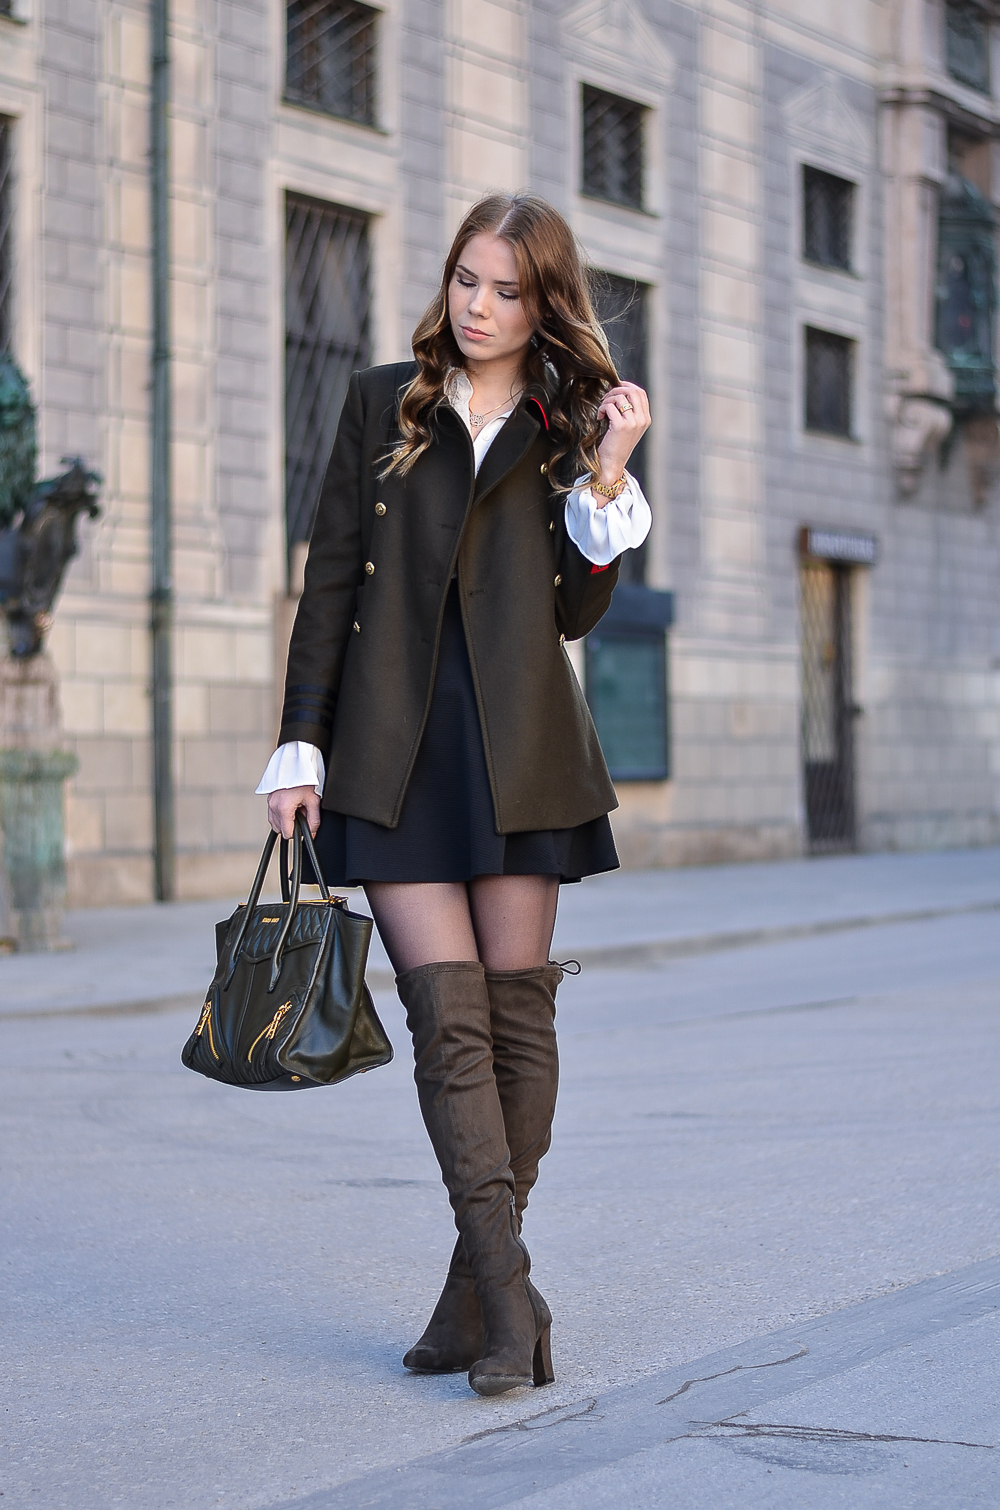 Outfit-Militärjacke-Military Look-khaki-Miu Miu Damen Tasche-Overknees mit Absatz-Modeblog München